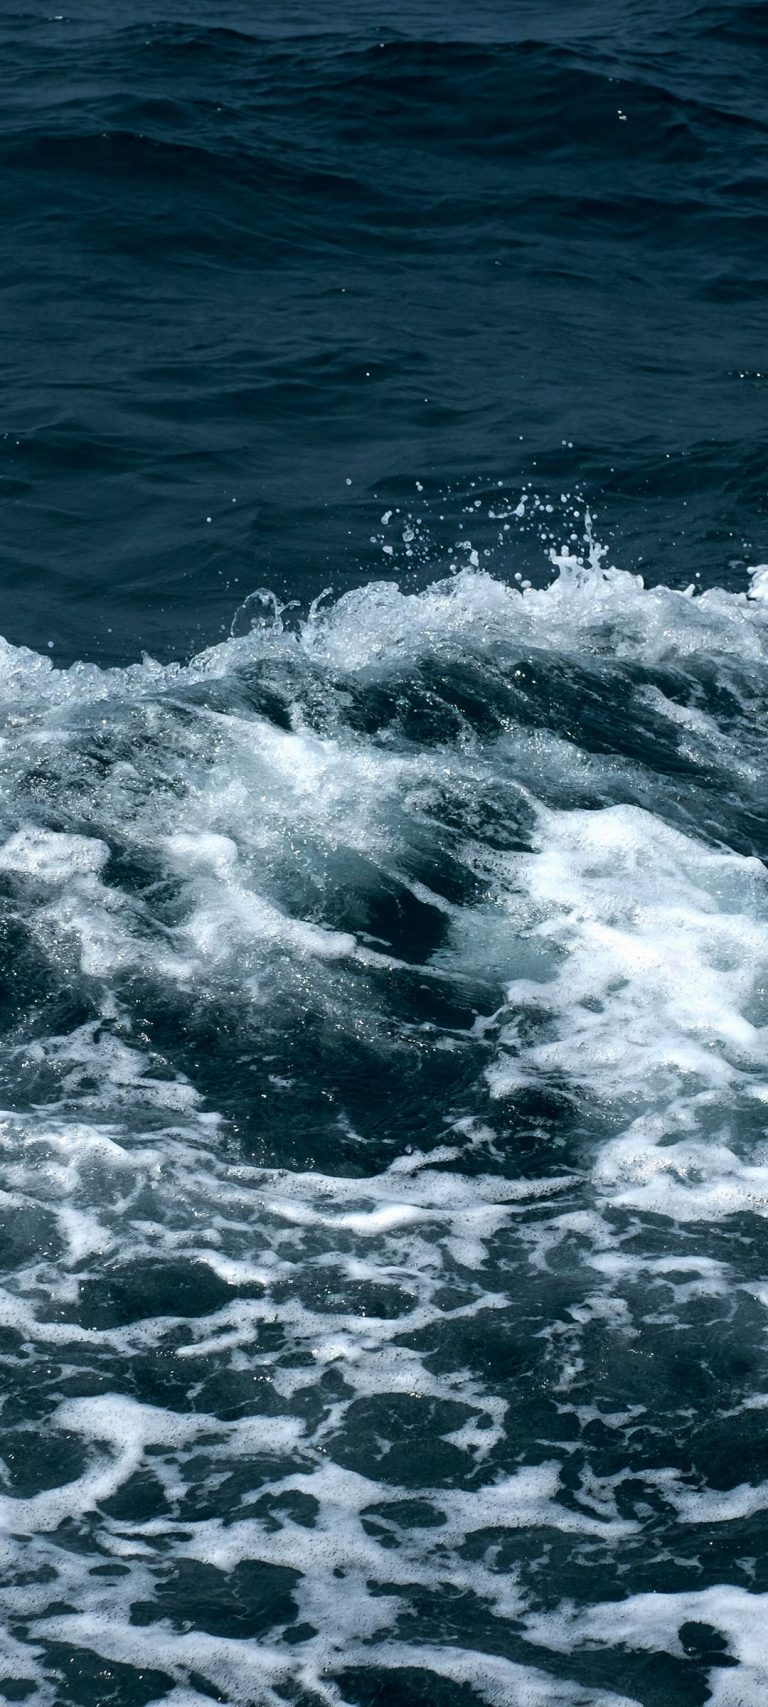 Sea Waves Foam Spray 1080x2400 768x1707